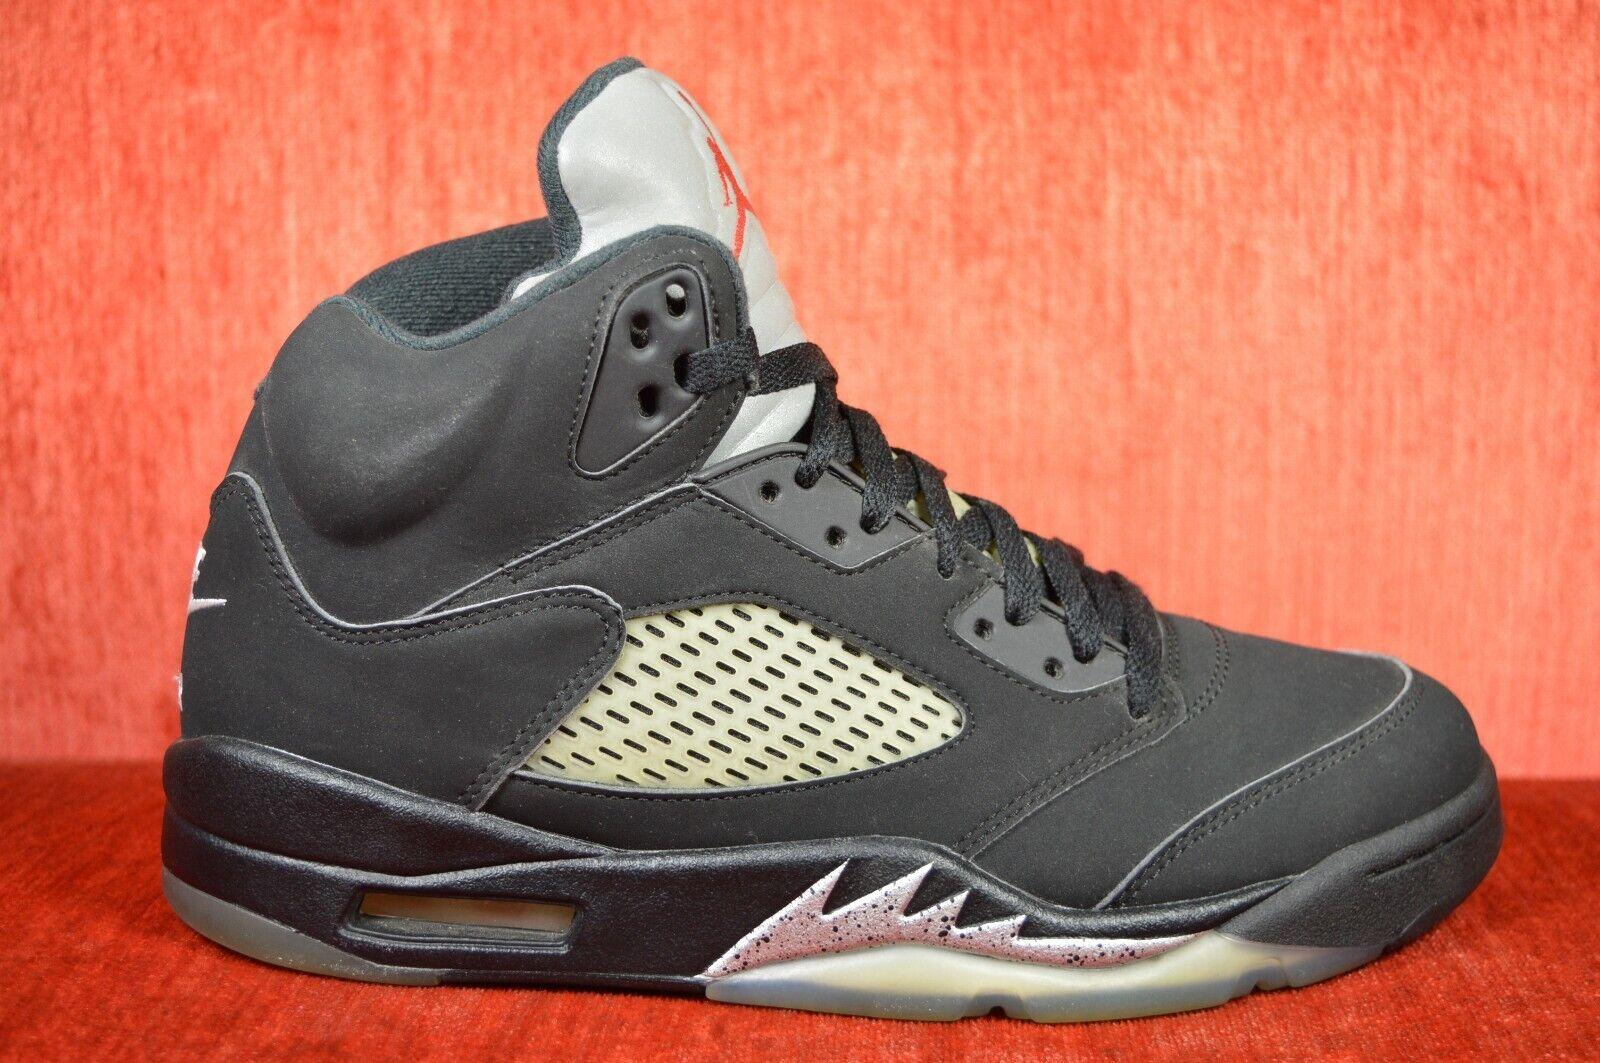 CLEAN Nike Air Jordan 5 Black Metallic OG Size 8.5 Silver 2016 845035-003